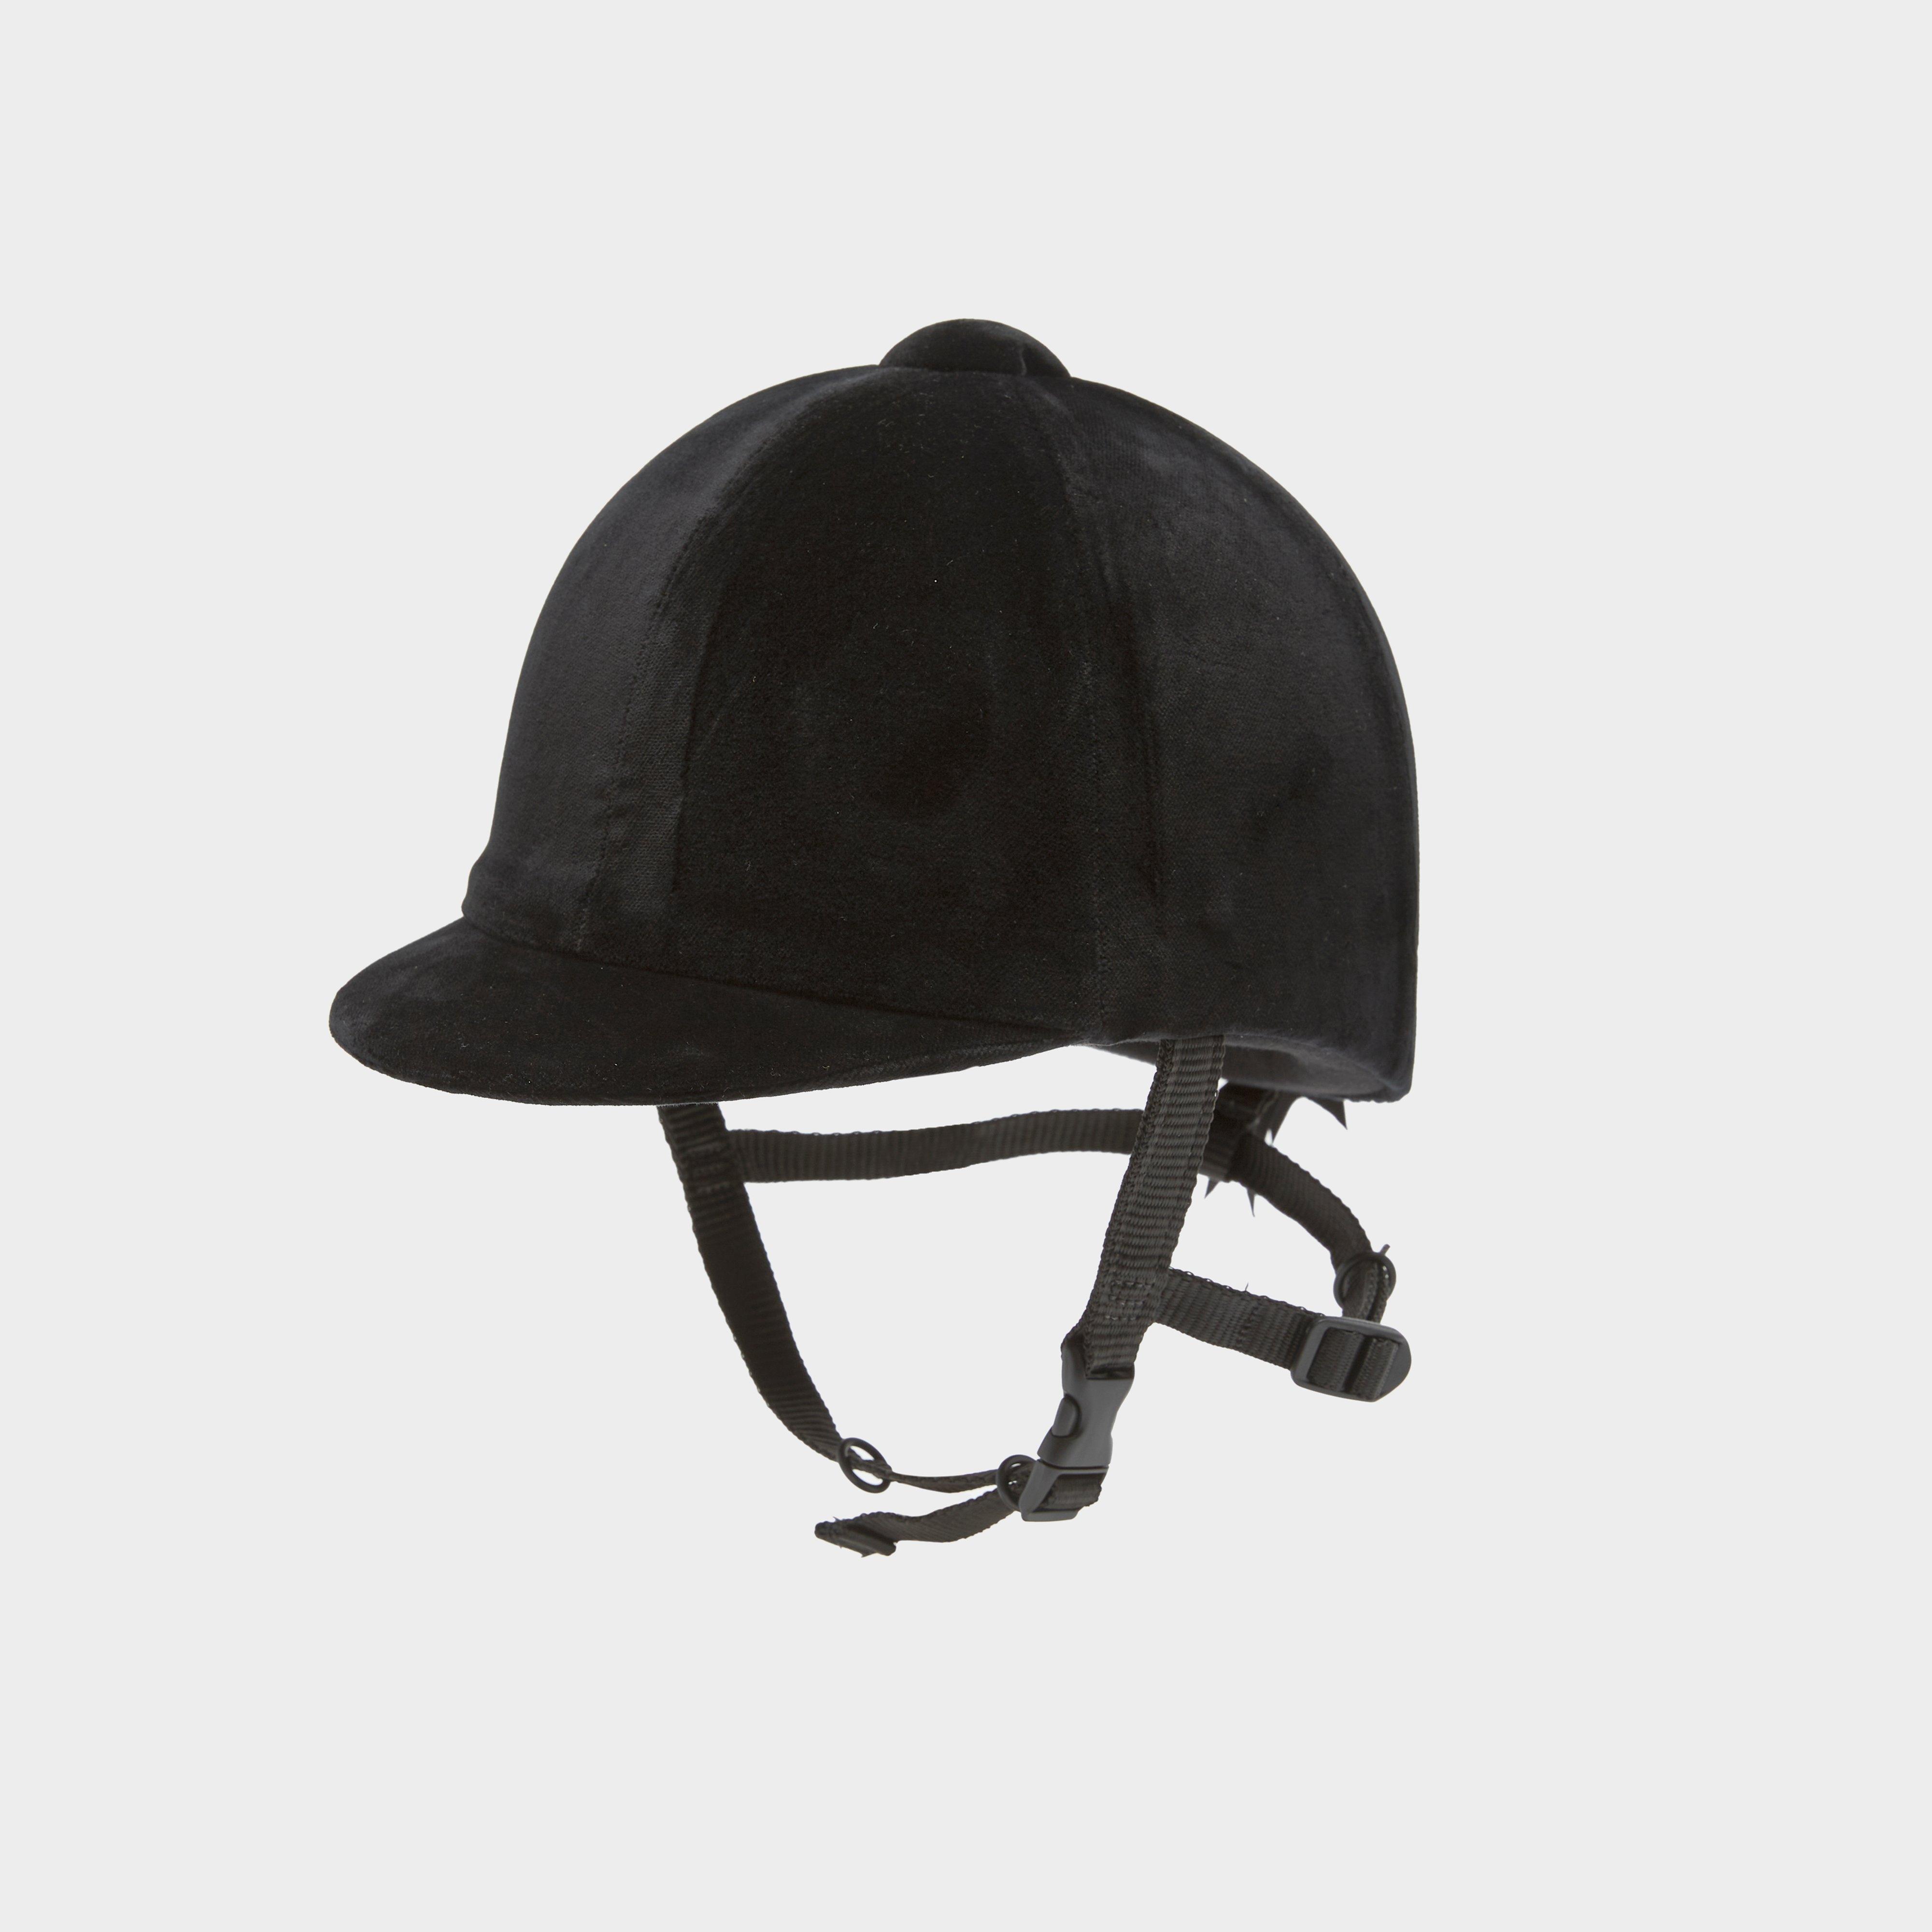 Champion Kids Cpx 3000 Helmet - Black/cpx-3000  Black/cpx-3000